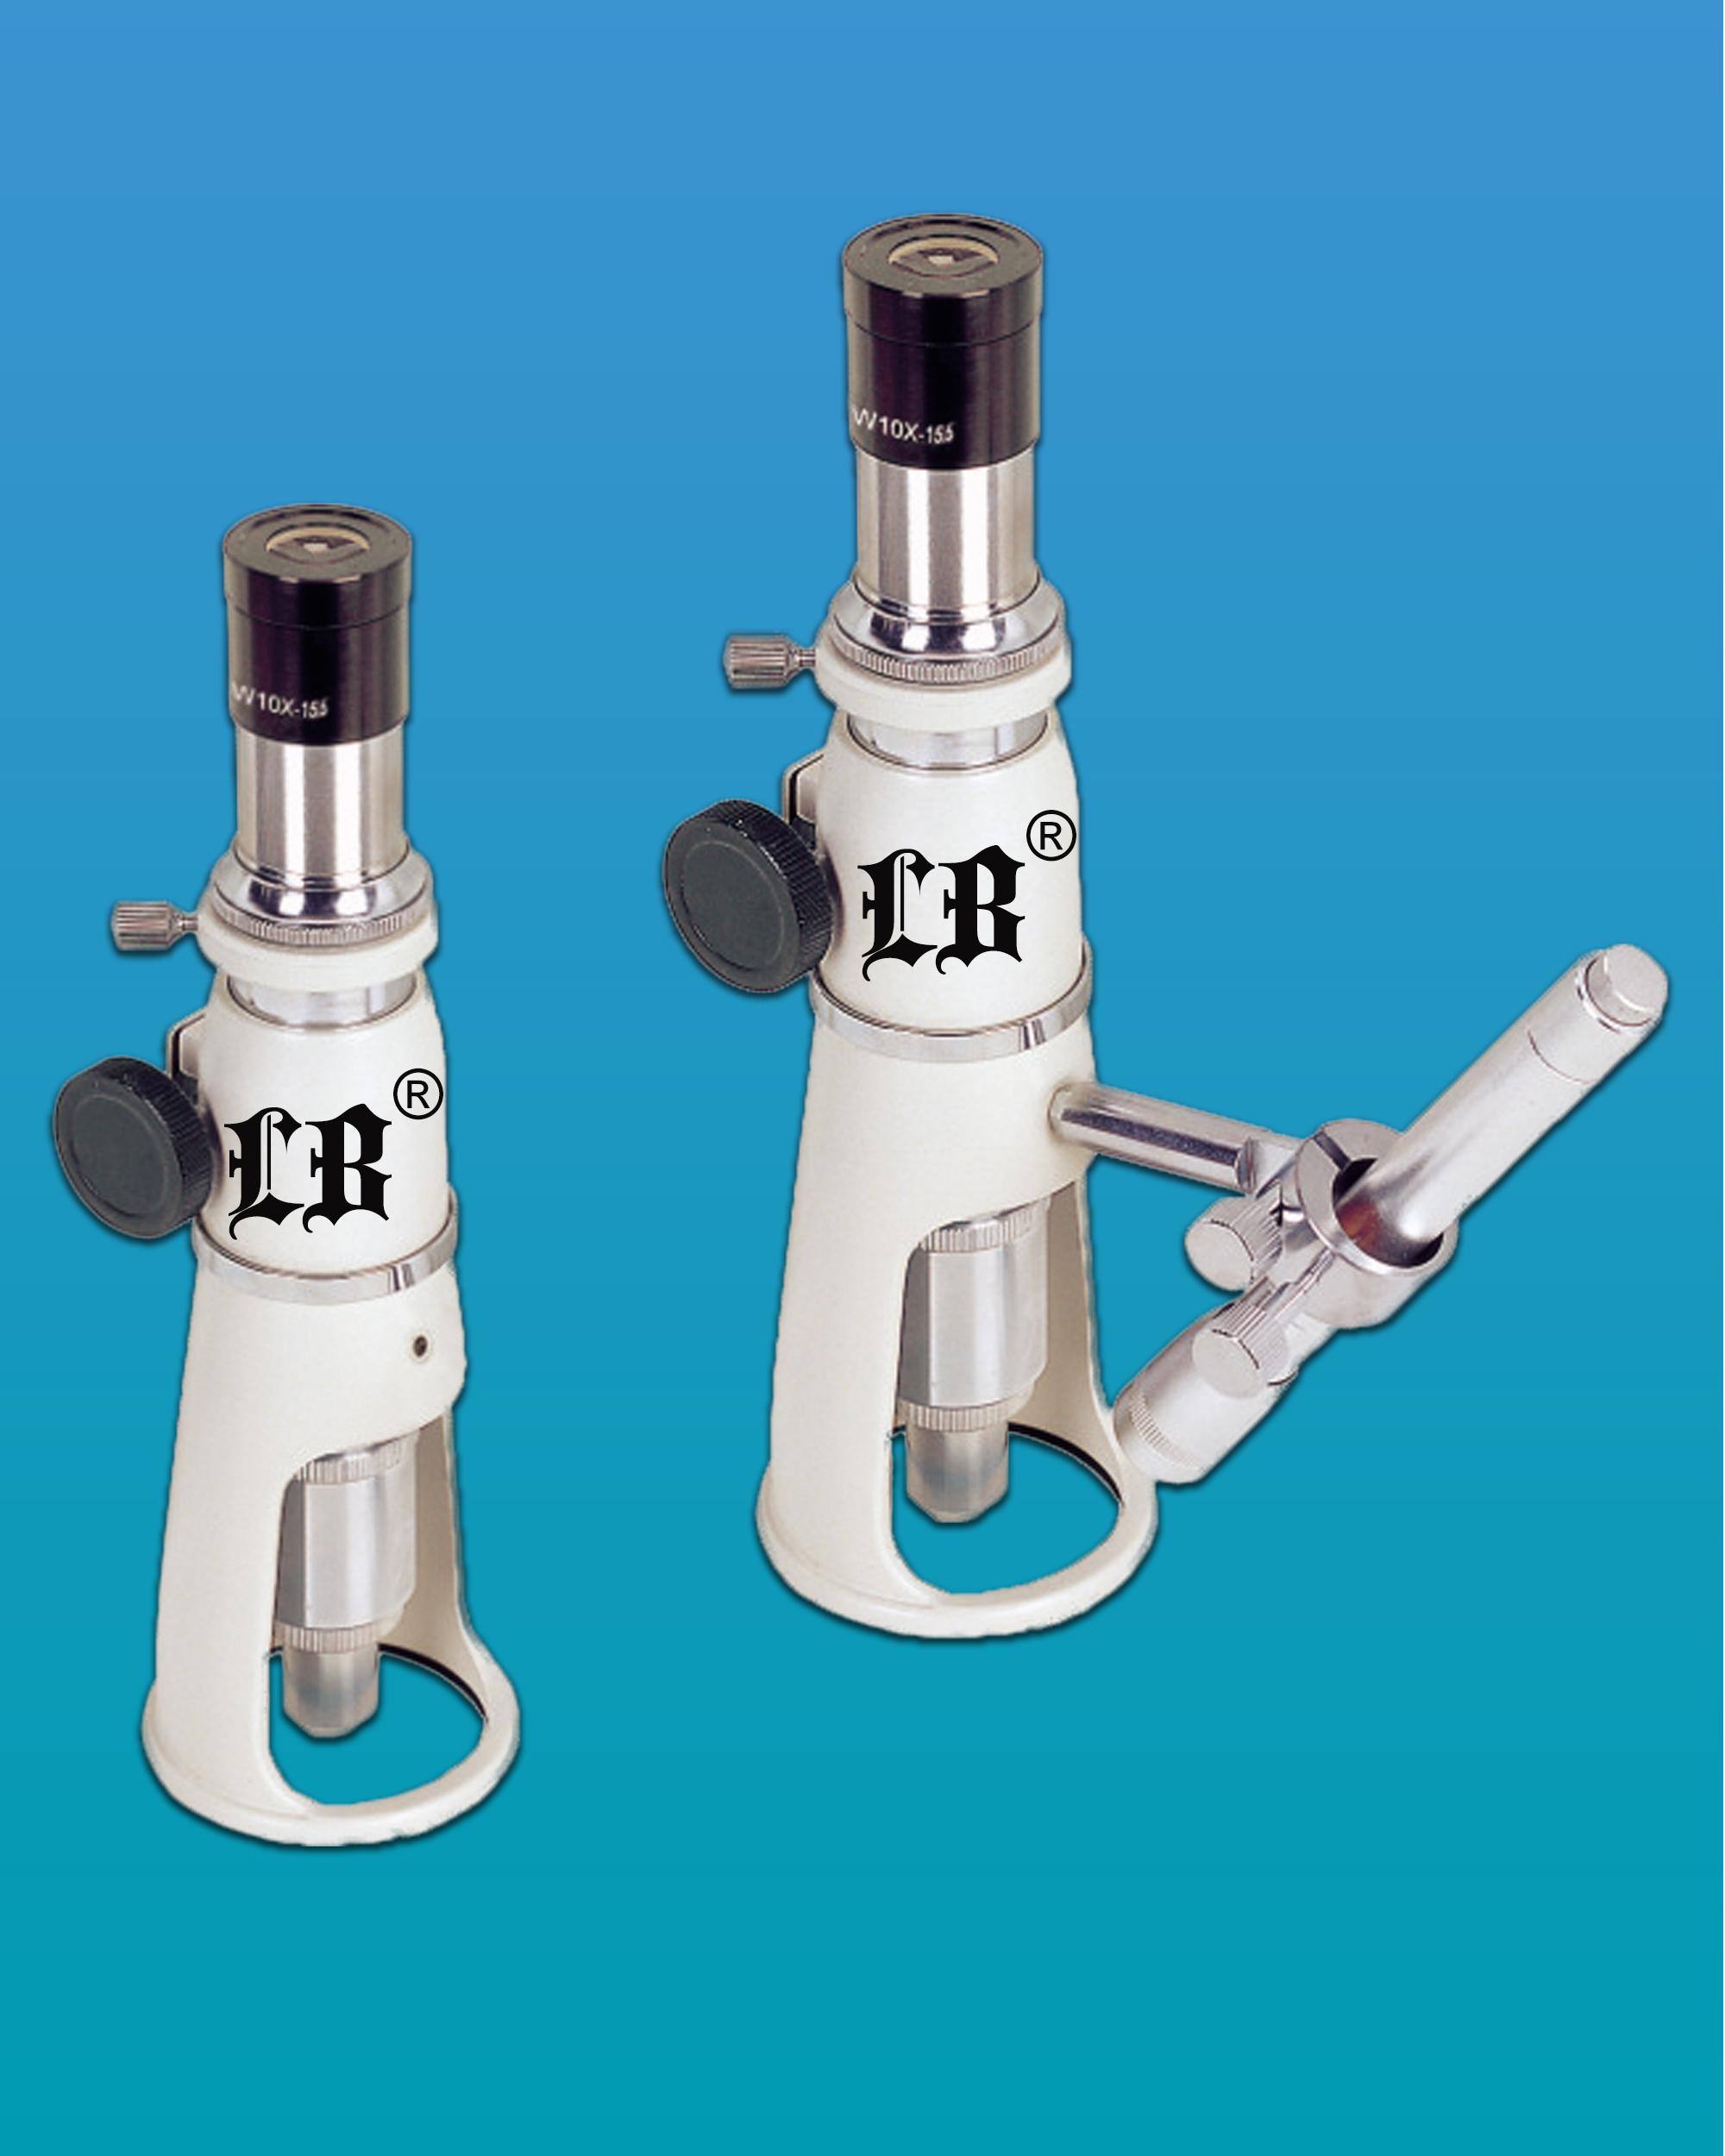 [LB-132] Portable Measuring Microscope